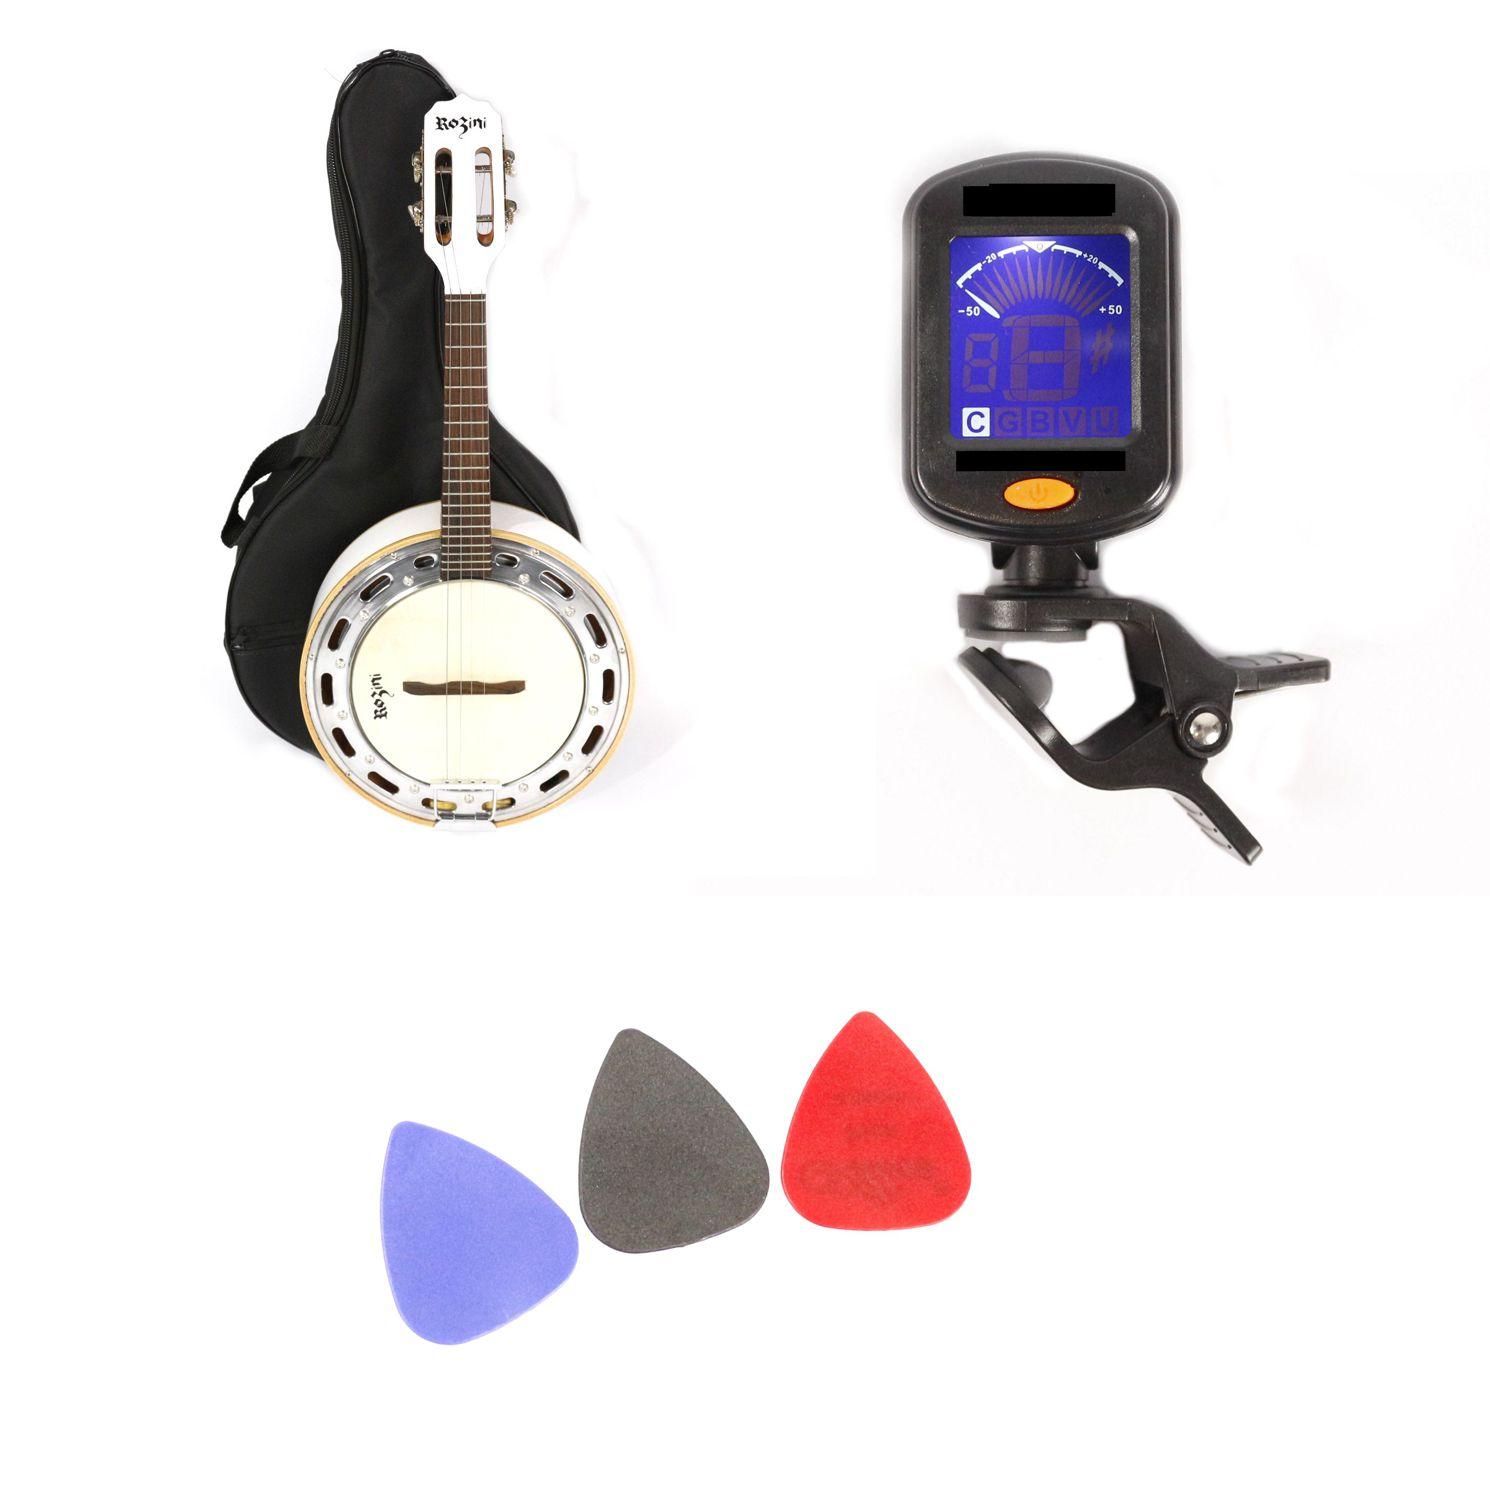 Kit com Banjo Rozini Studio Branco com Capa, Palhetas e Afinador RJ11 Branco